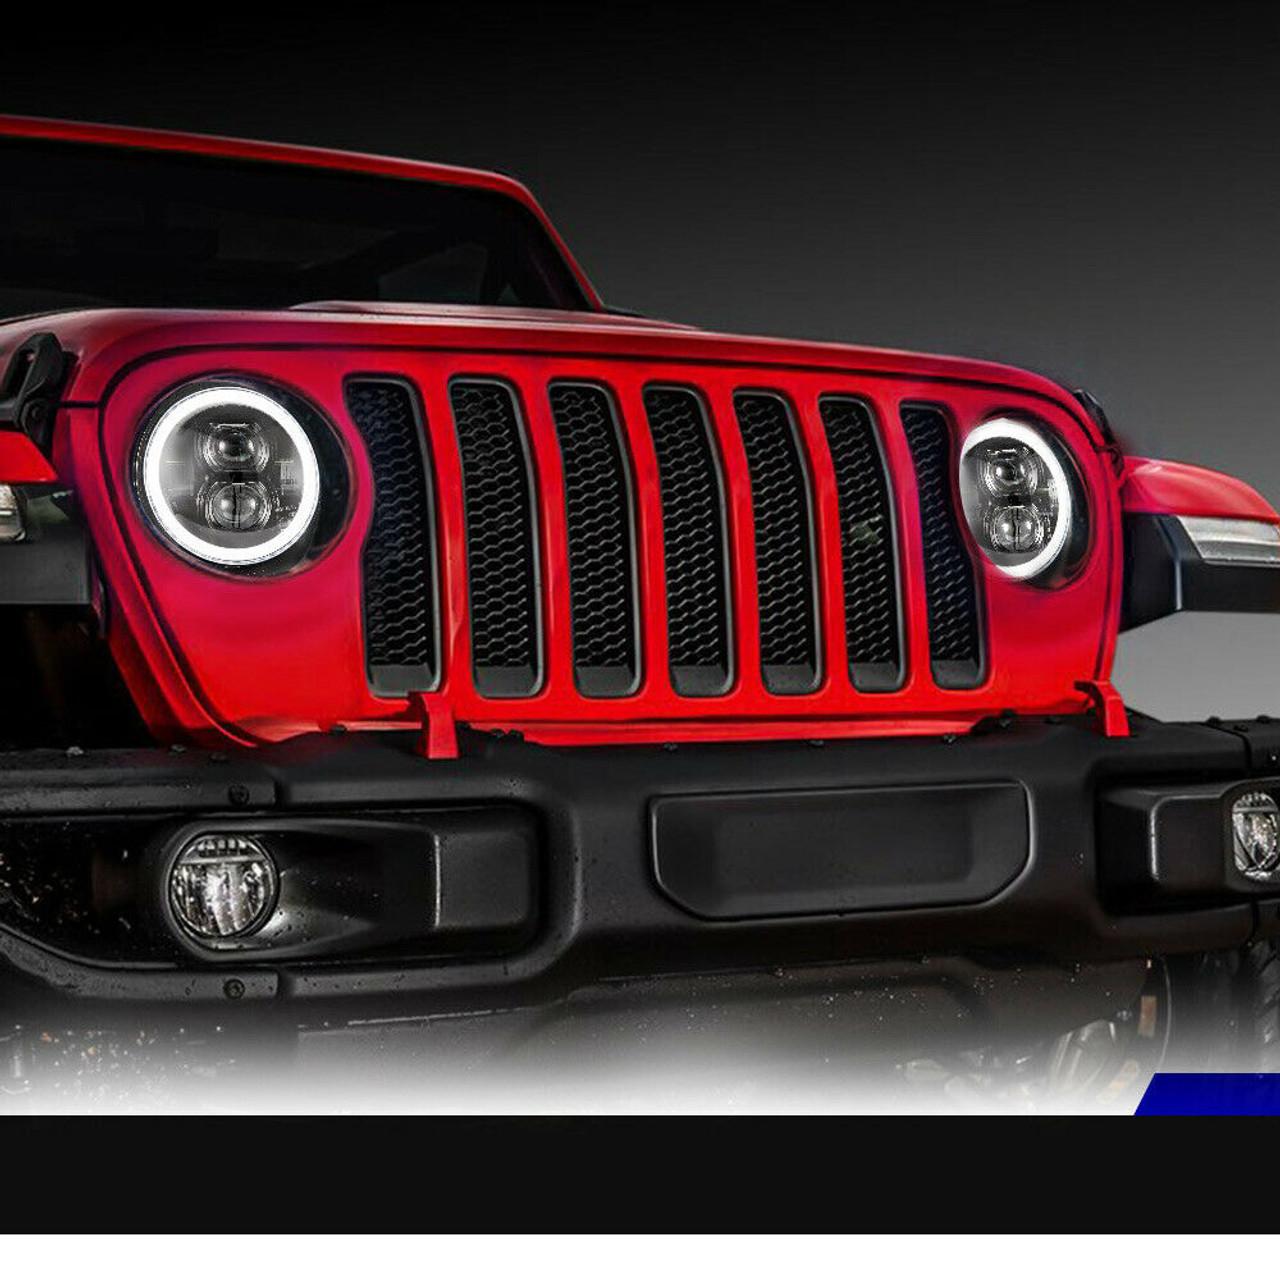 Jeep Halo Headlights >> Halo 9 Inch Led Headlights For Wrangler Jl Gladiator 2018